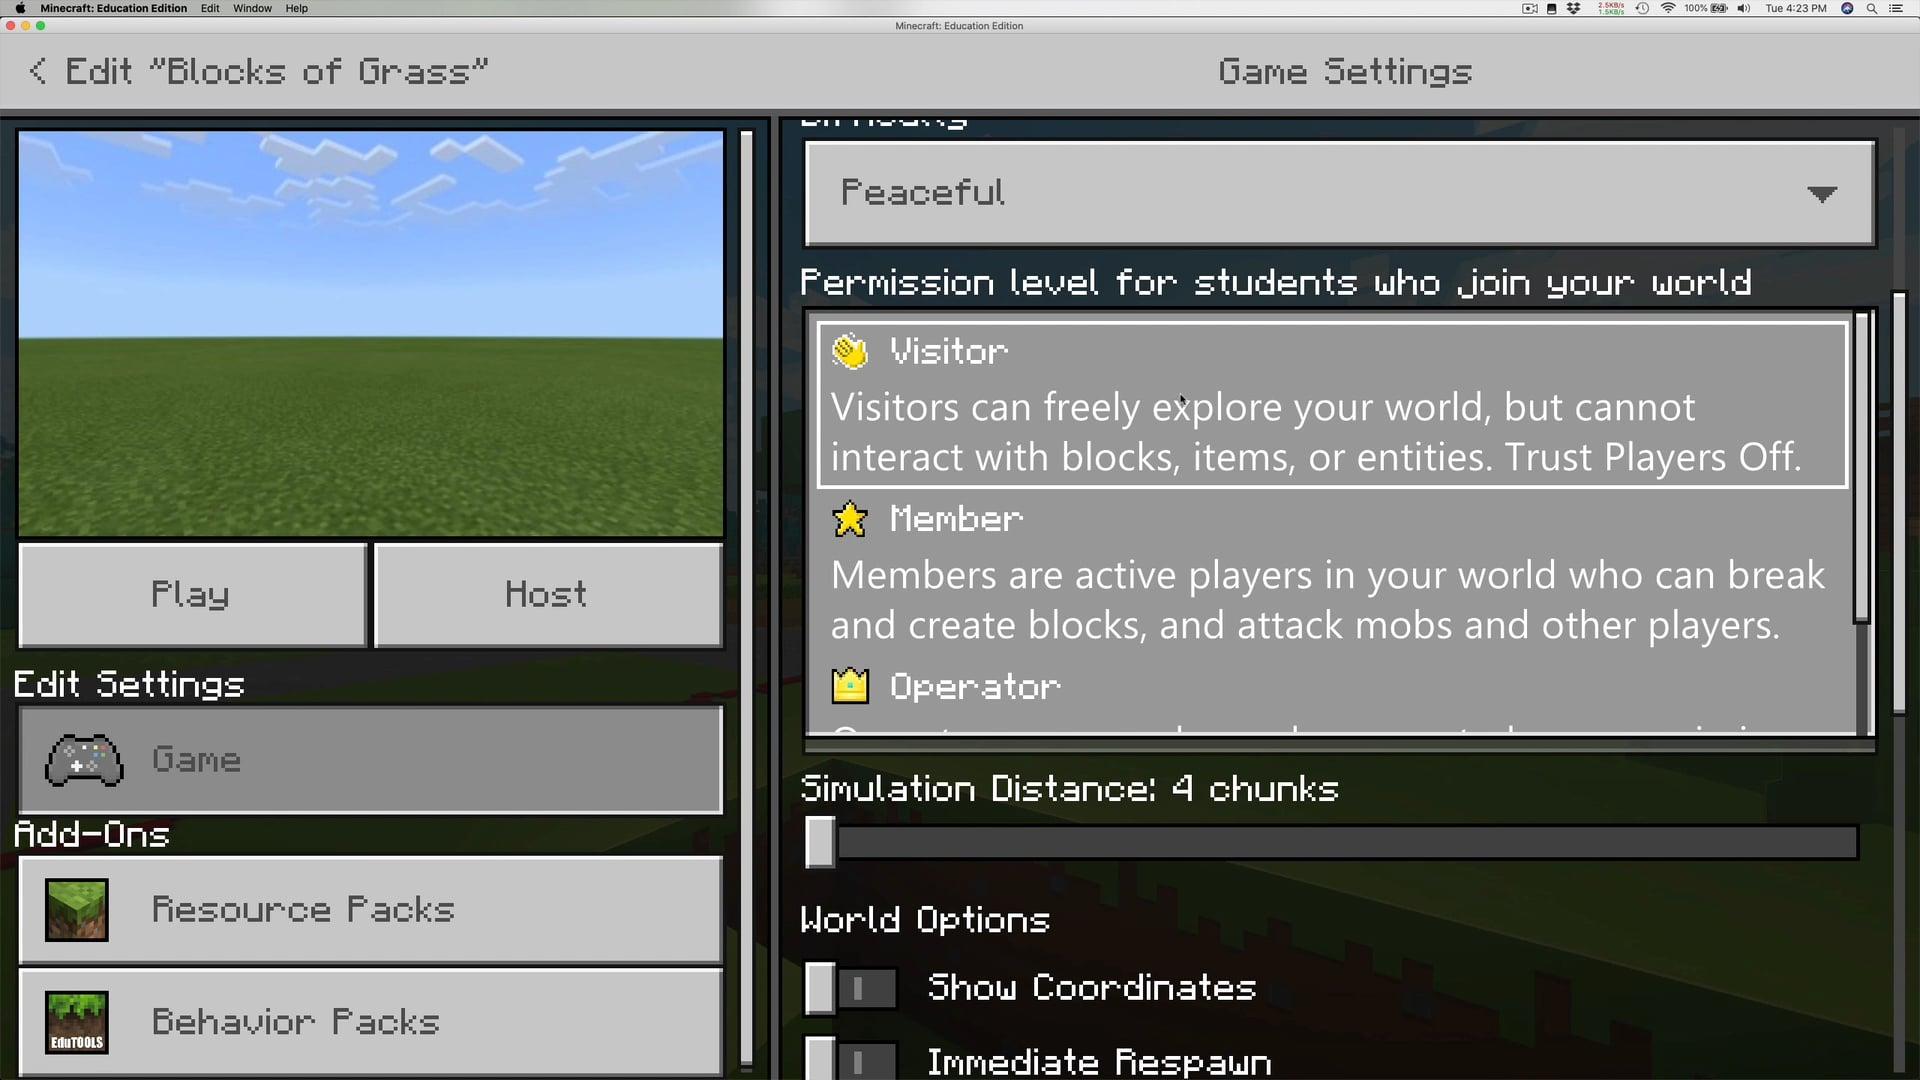 Part 2: Settings Classroom Mode